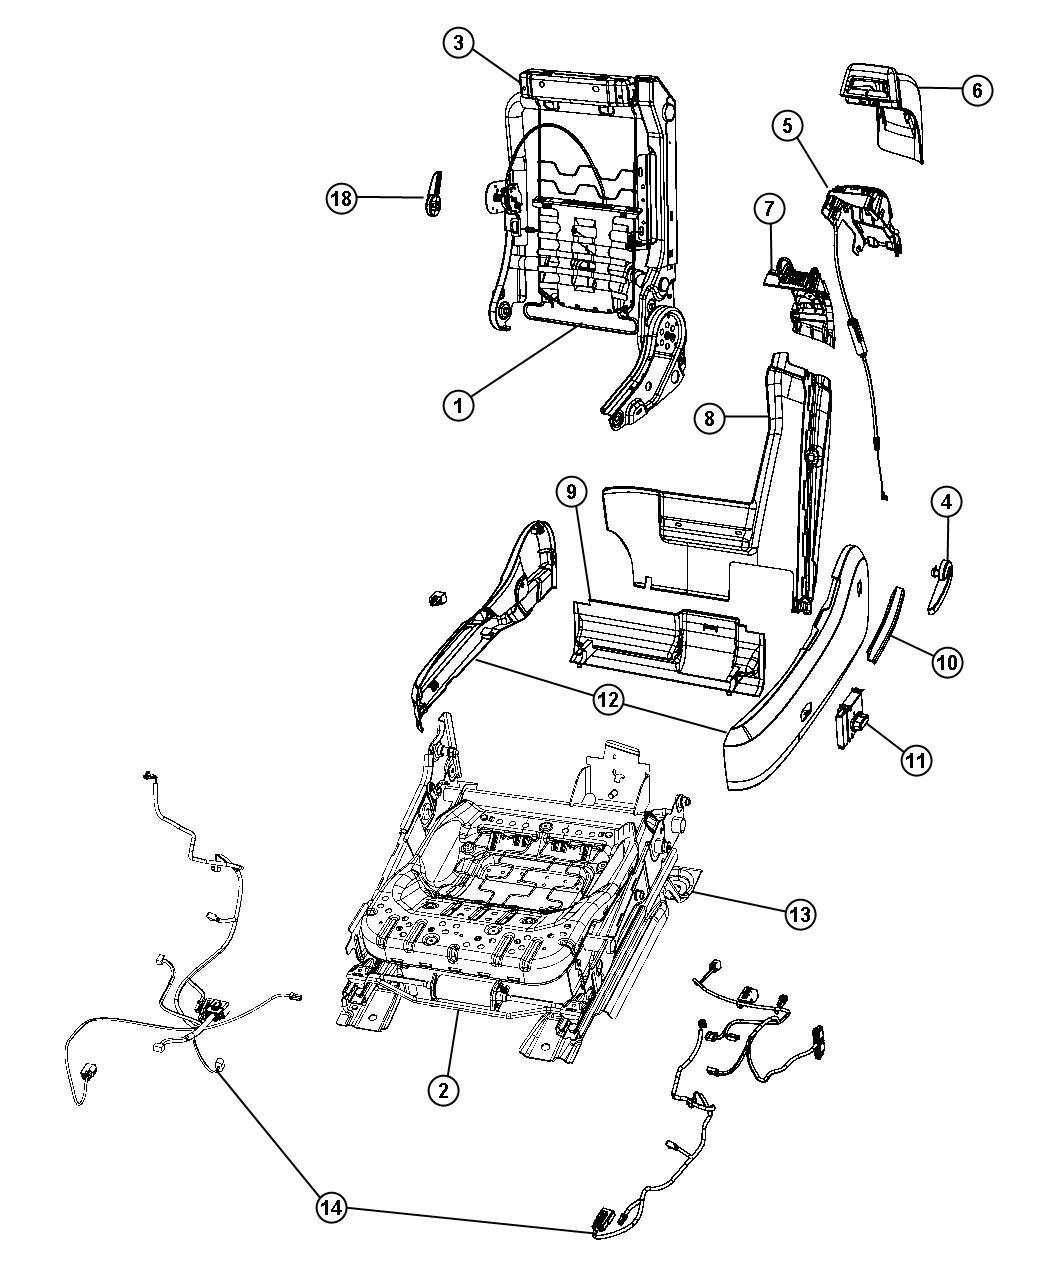 2008    Chrysler    Sebring Motor    Power       seat    Trim   premium